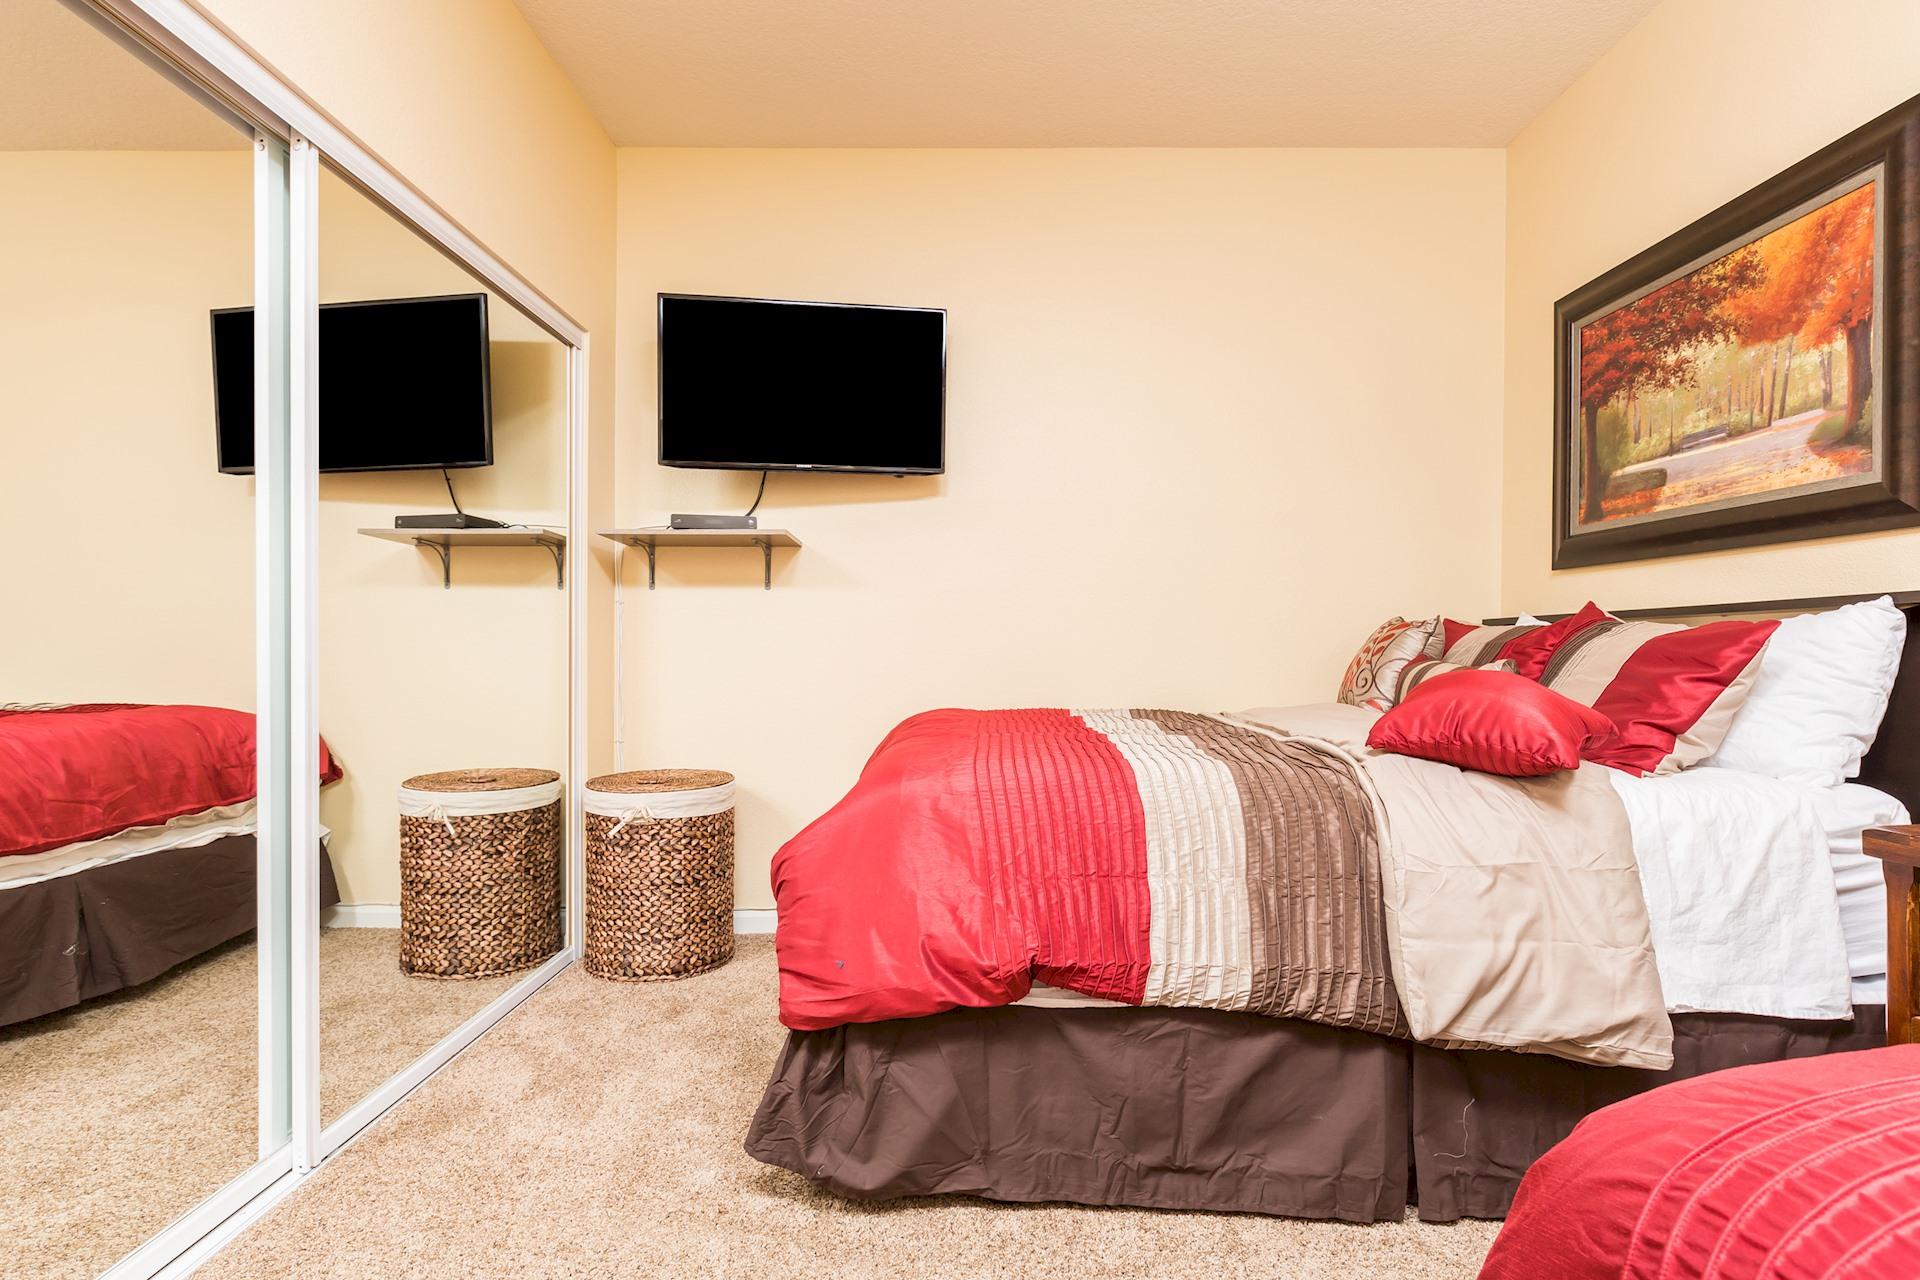 Apartment PALM DESERT LUXURY VIP HOME w POOL DESERT PARADISE photo 20371868